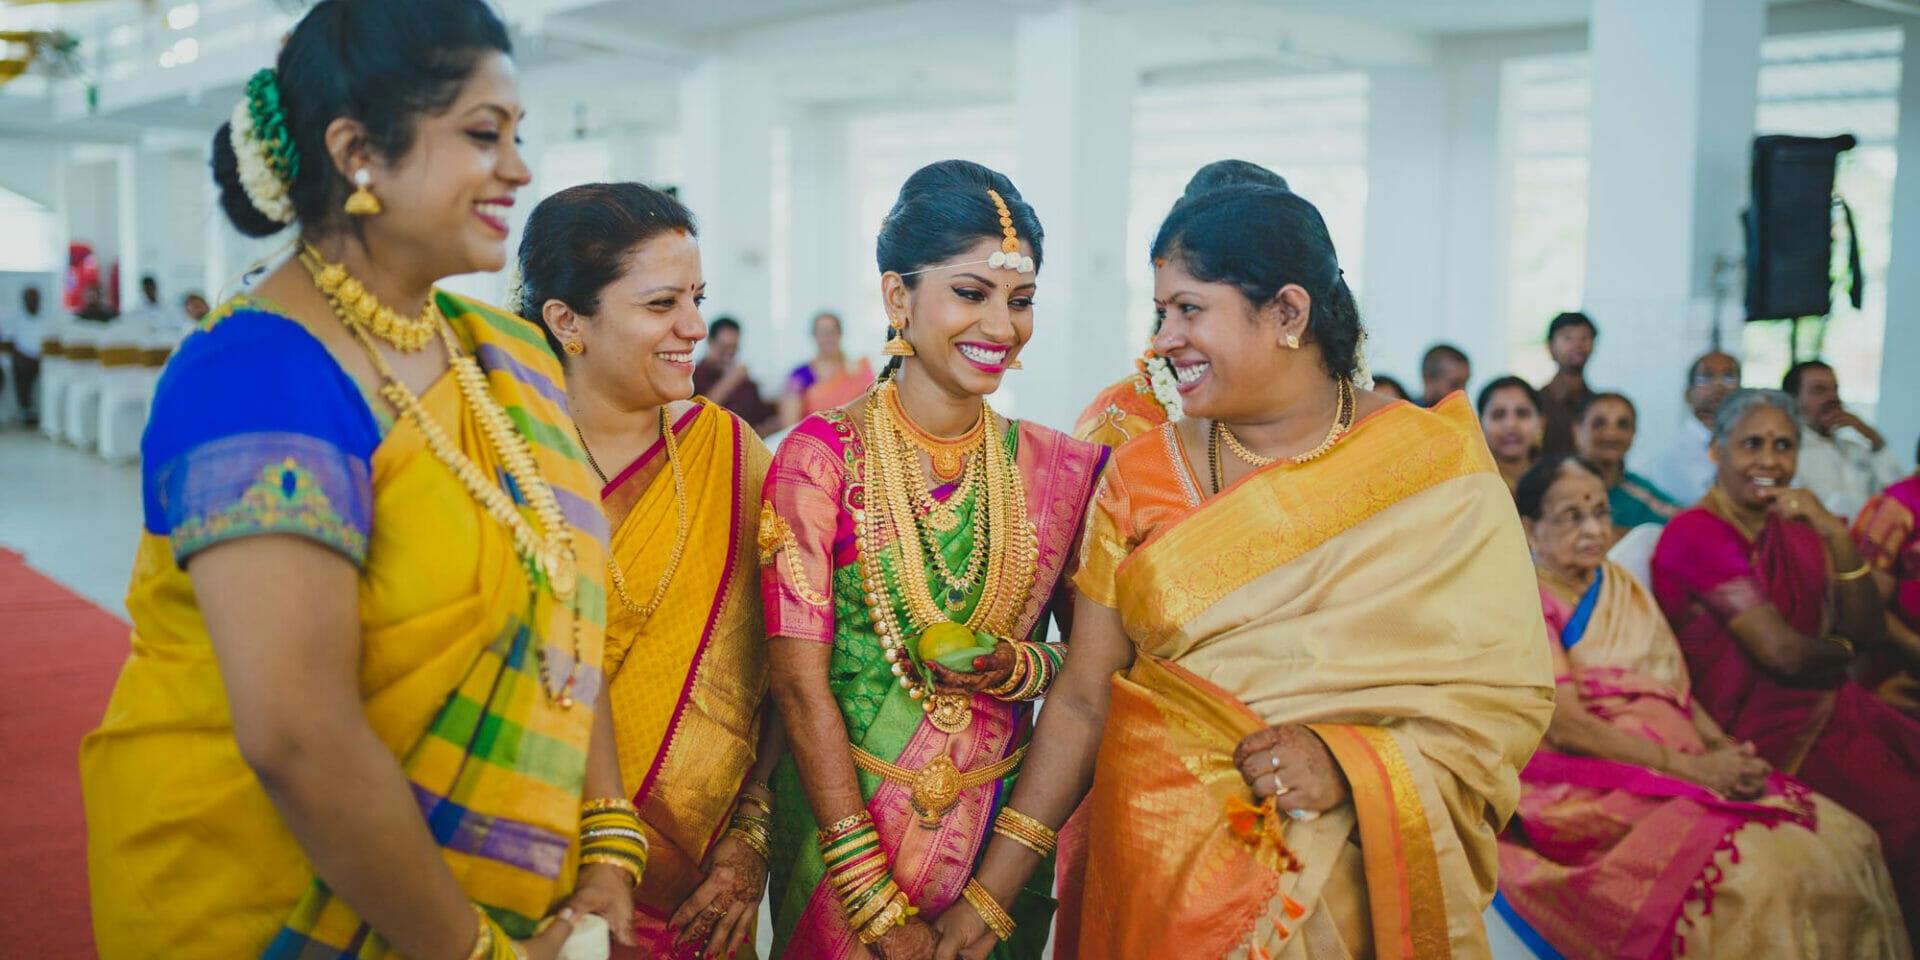 shruti annayya sree vikash photography wedding kalathur gardens 18